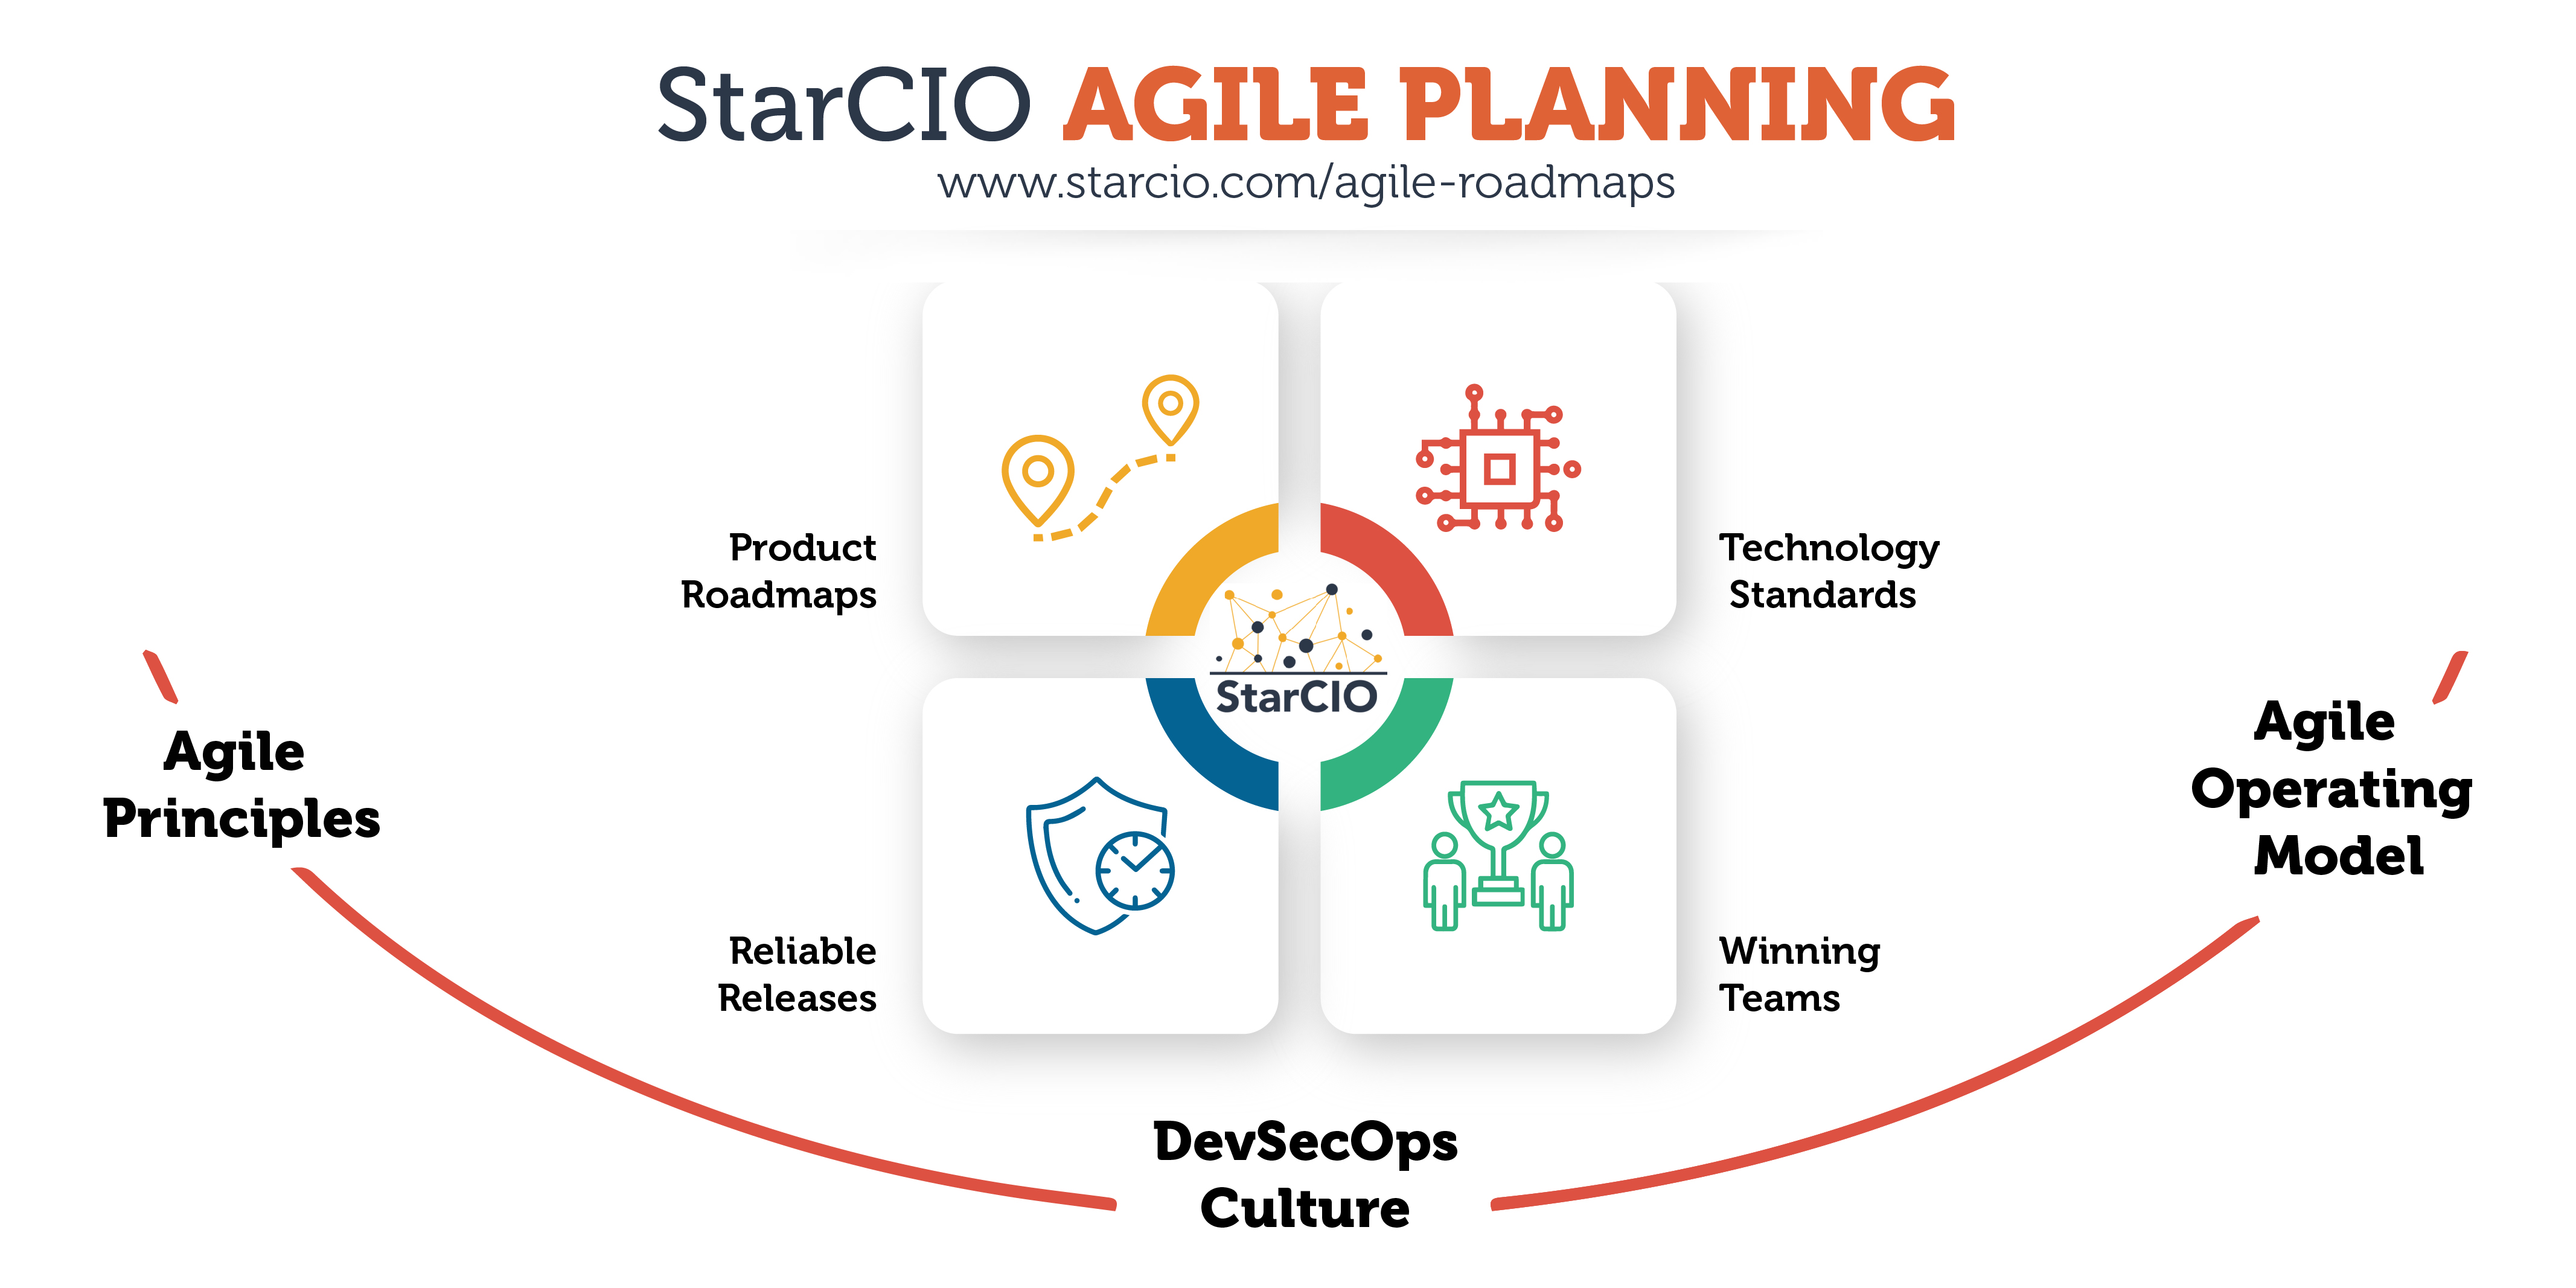 StarCIO Agile Roadmaps